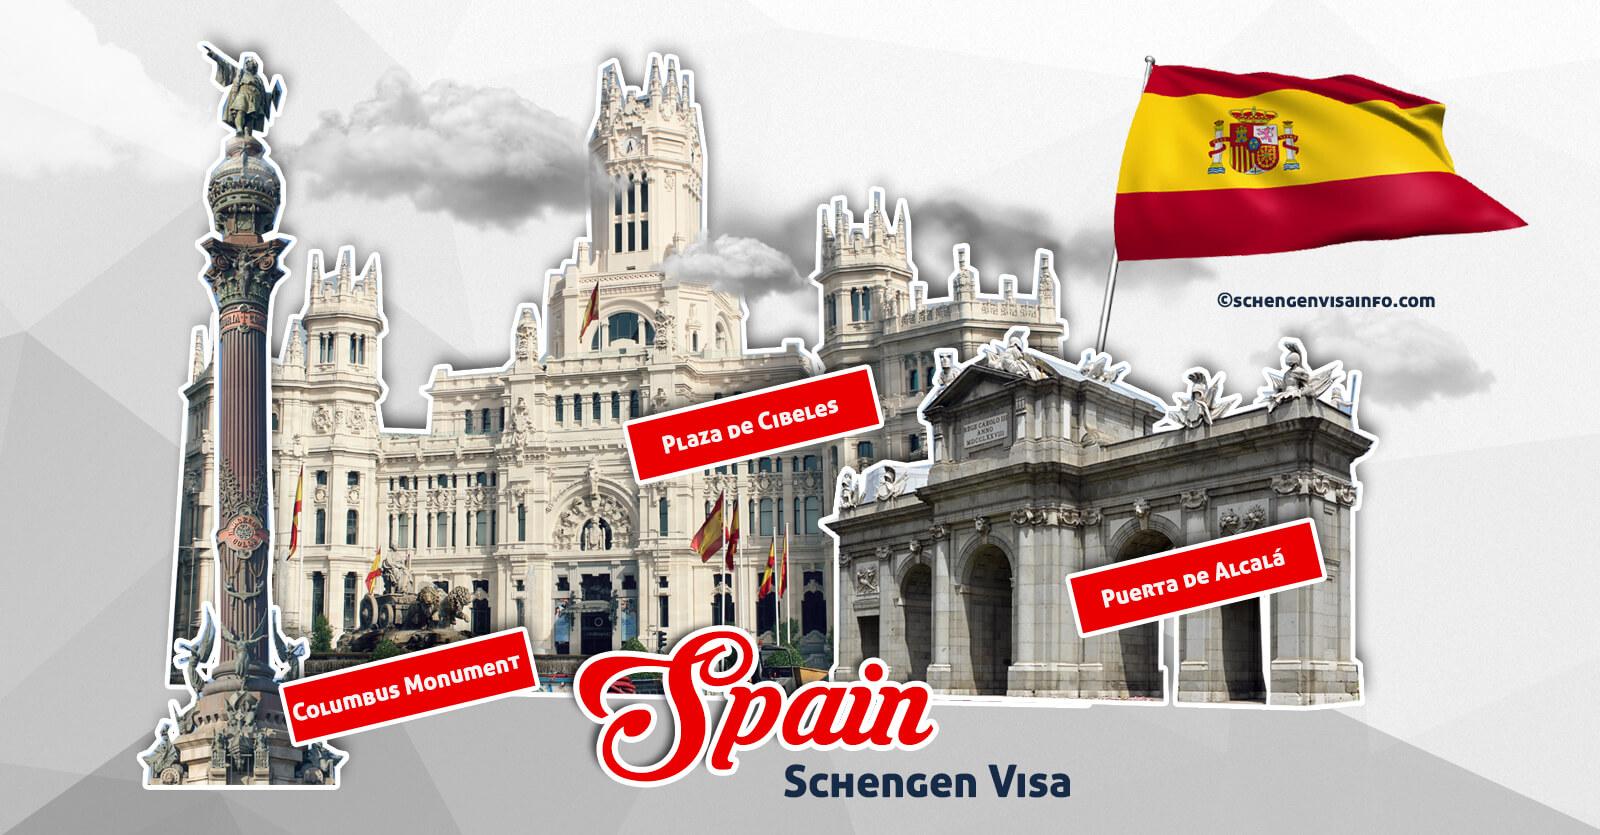 Spain-Visa Visa Application Form To Czech Republic on visa to india, visa to hungary, visa to nigeria, visa to mexico, visa to spain,